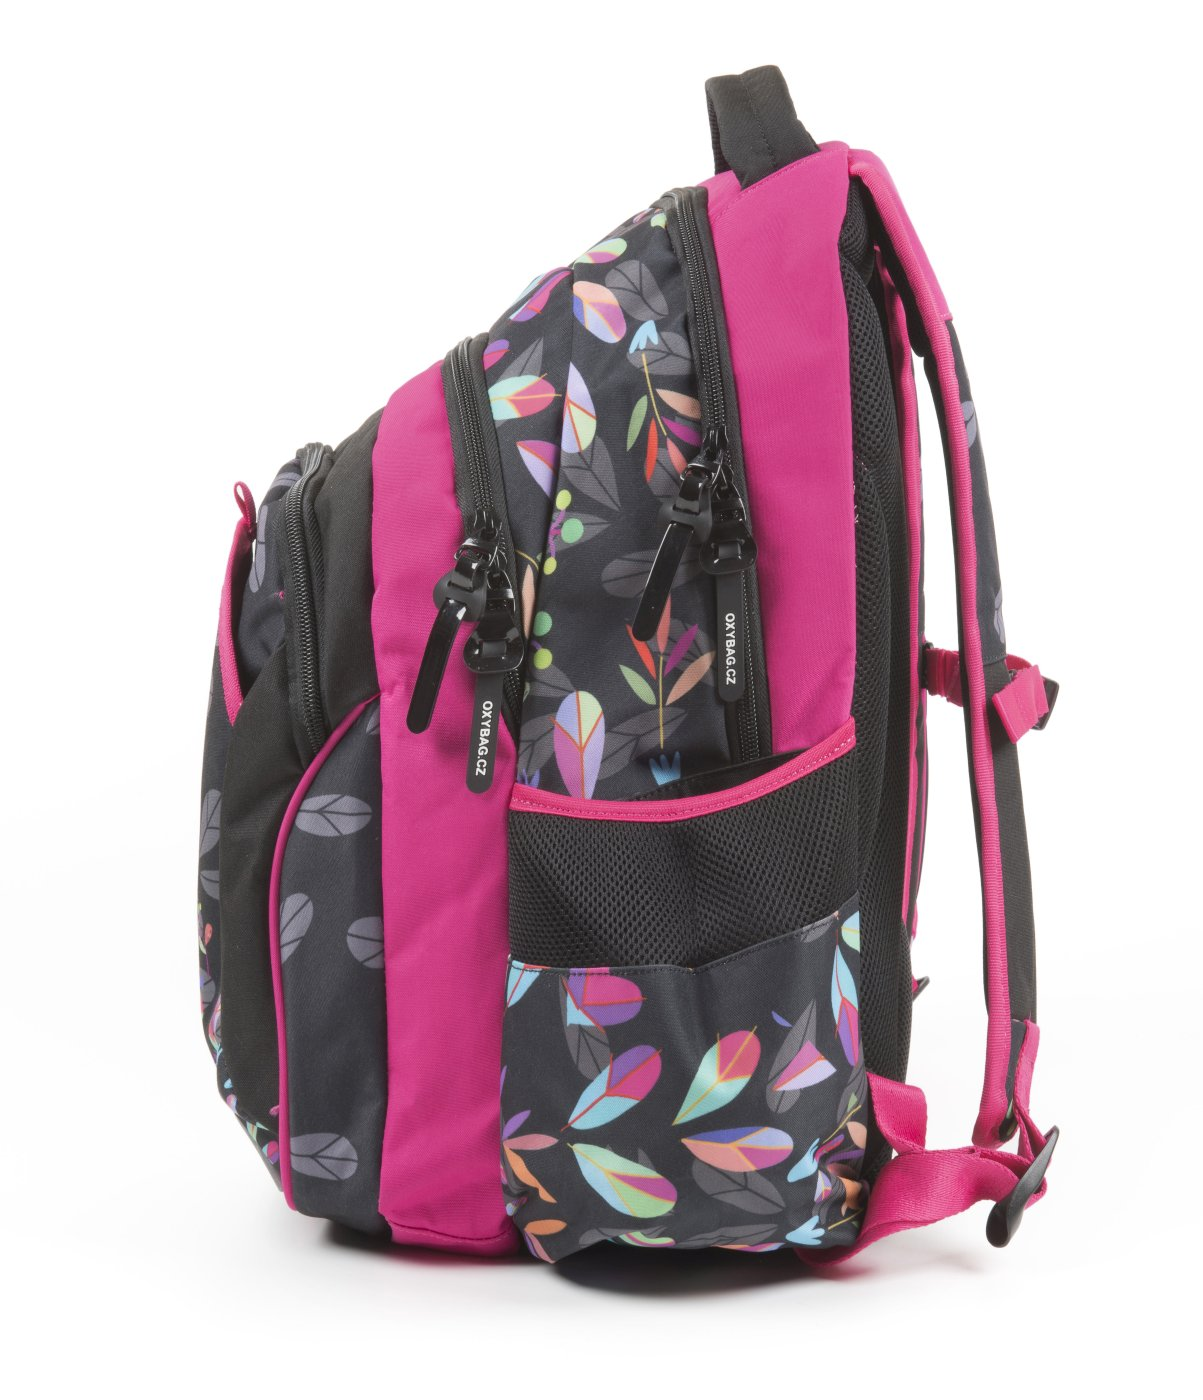 0eb11b1dd6 ... Studentský batoh OXY Fashion Flowers Bez licence · Image. FLOWERS